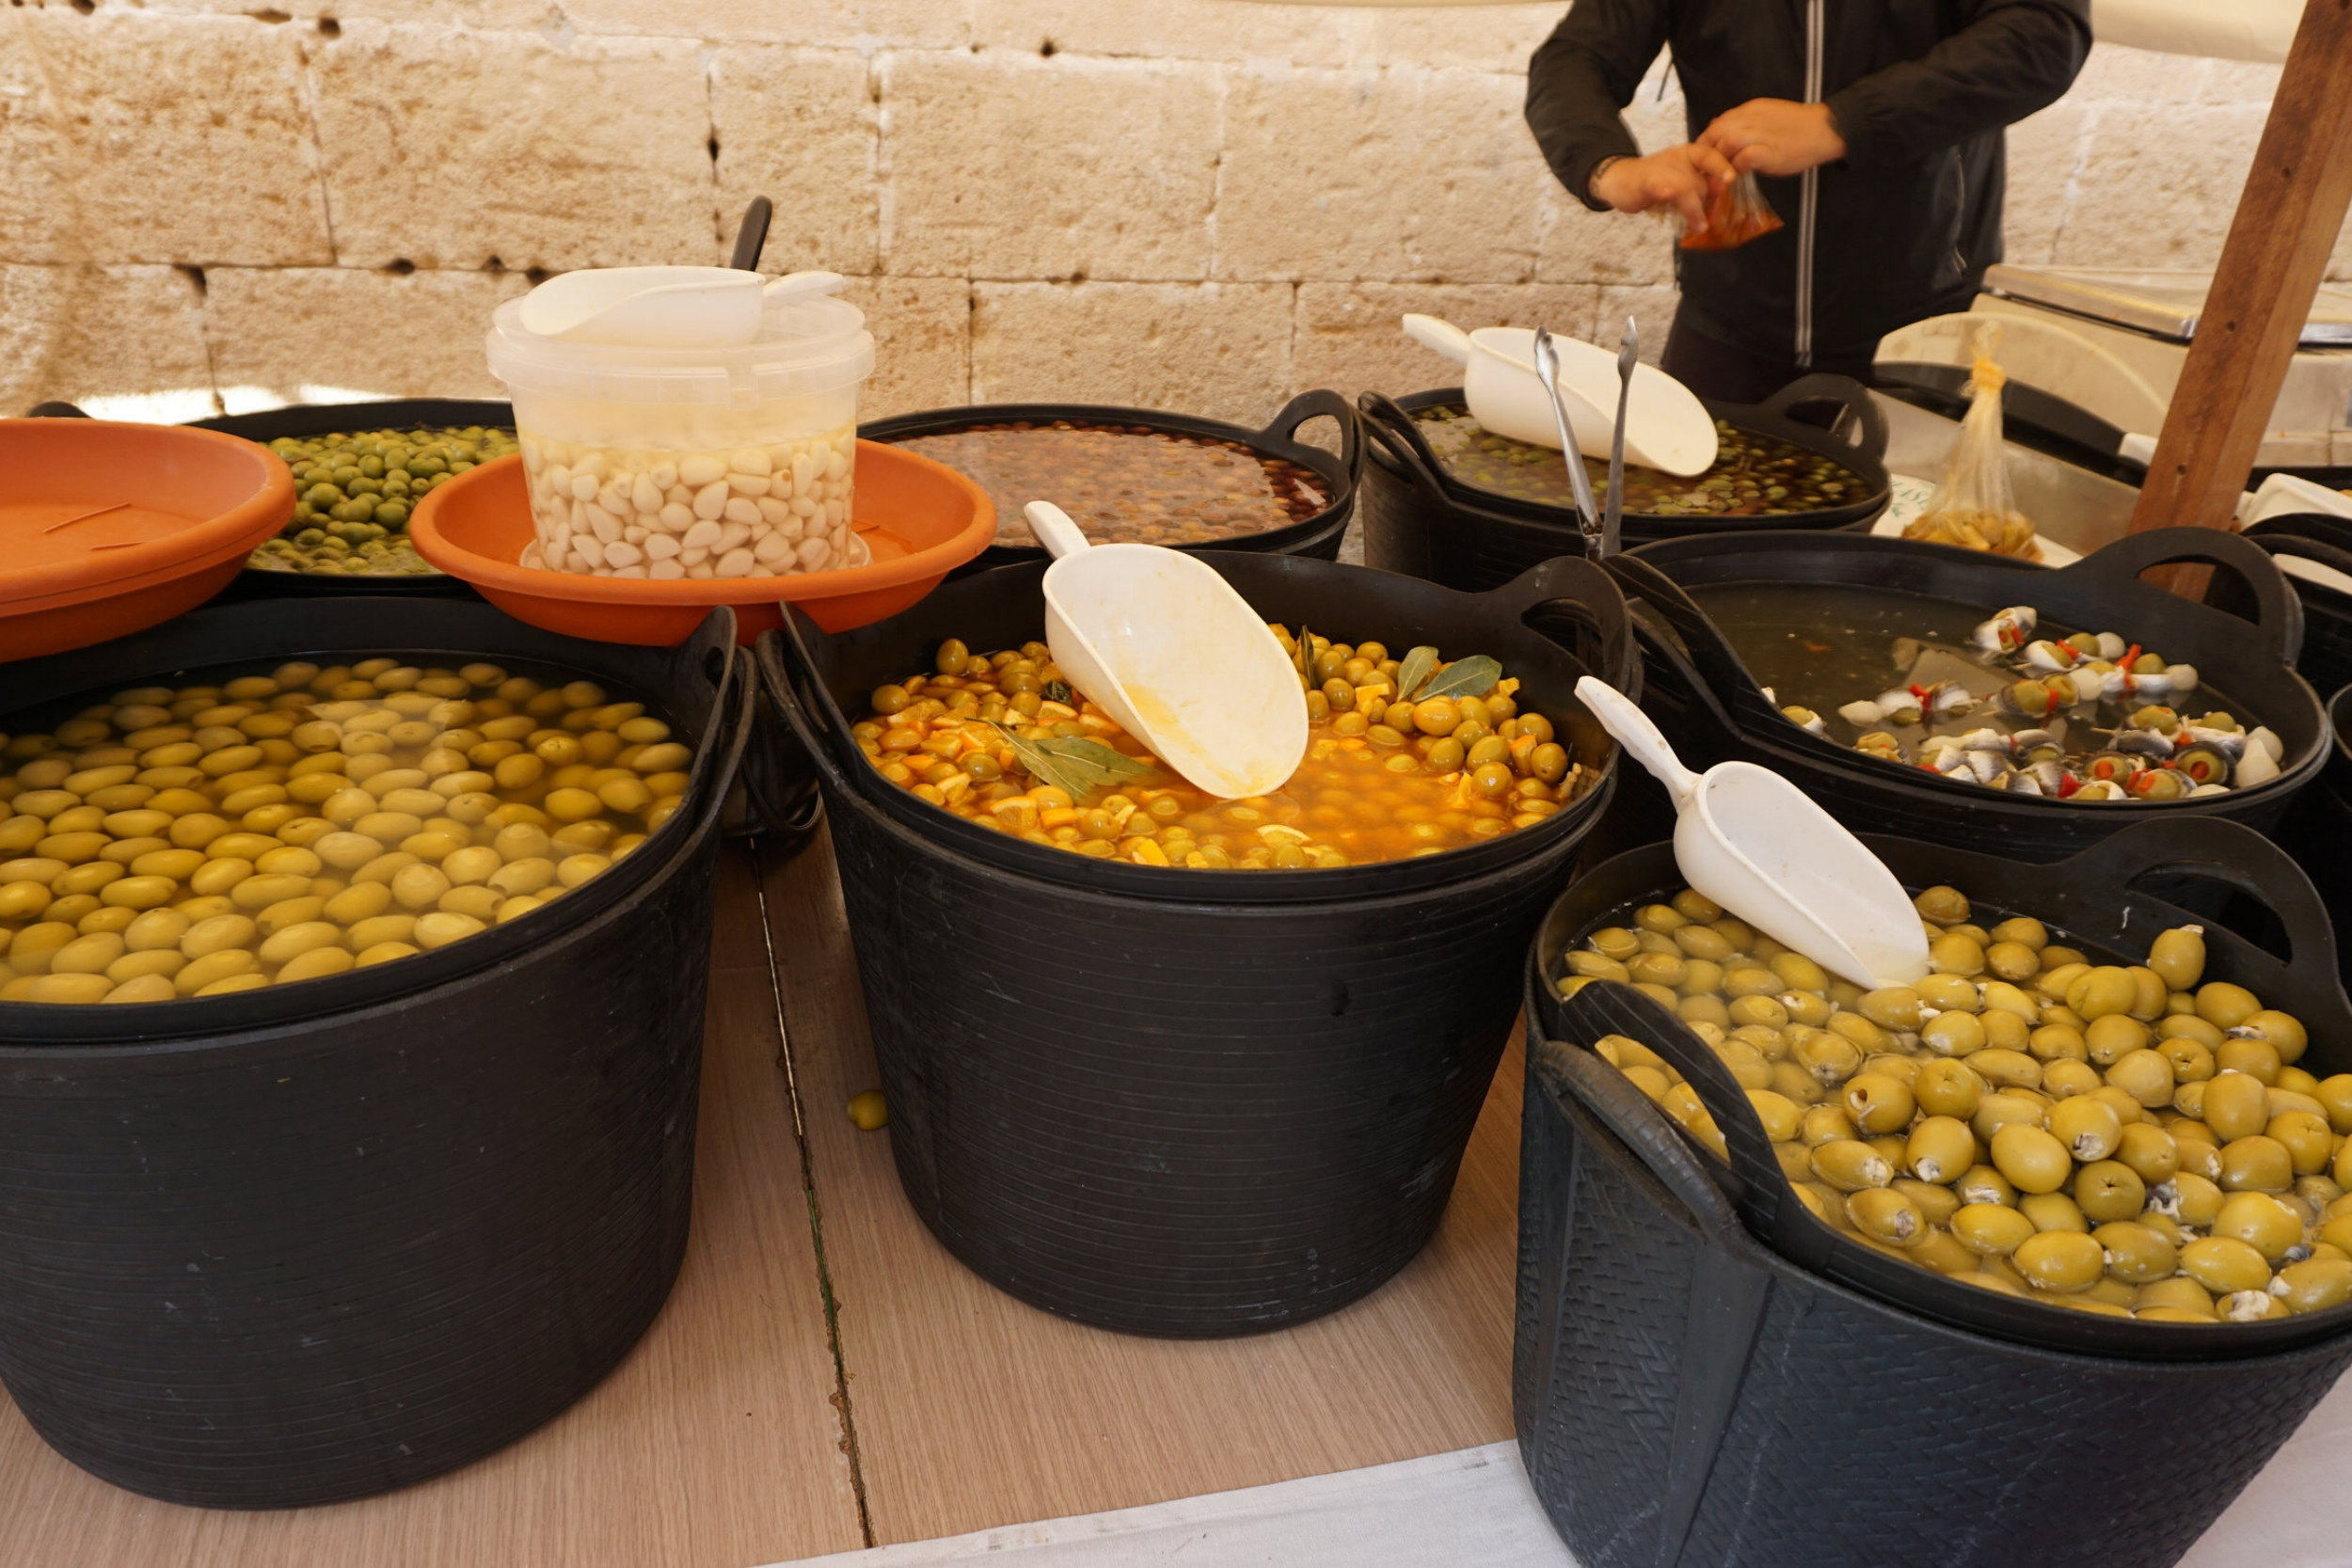 Olive vendor in downtown Jávea, Spain